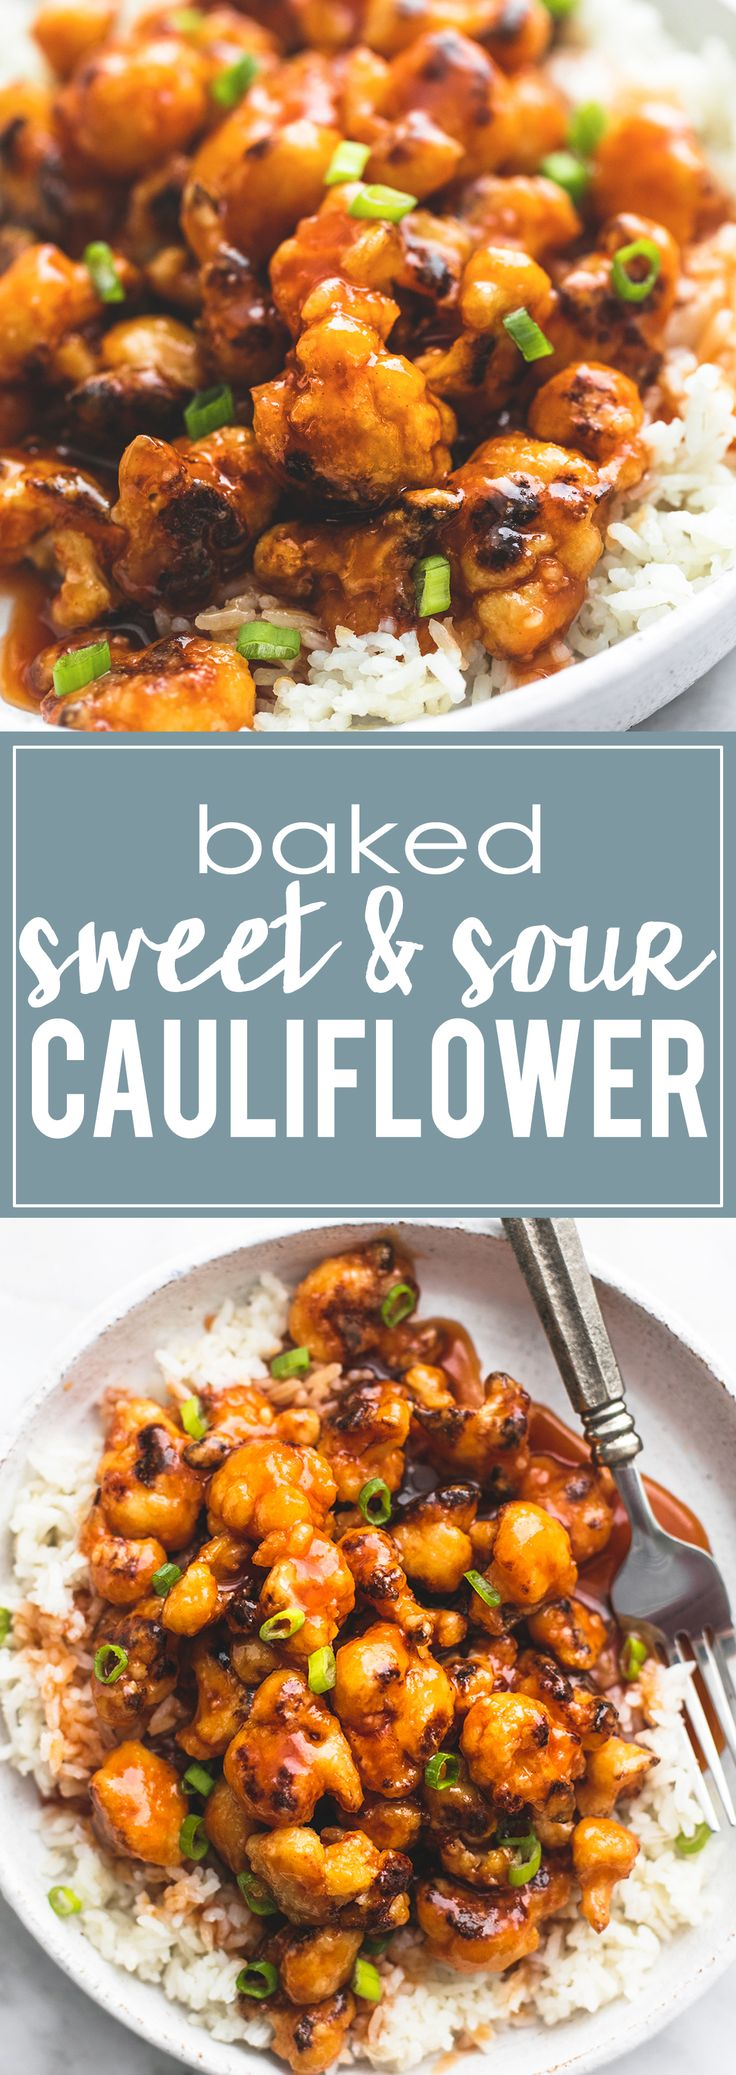 Baked Sweet Sour Cauliflower